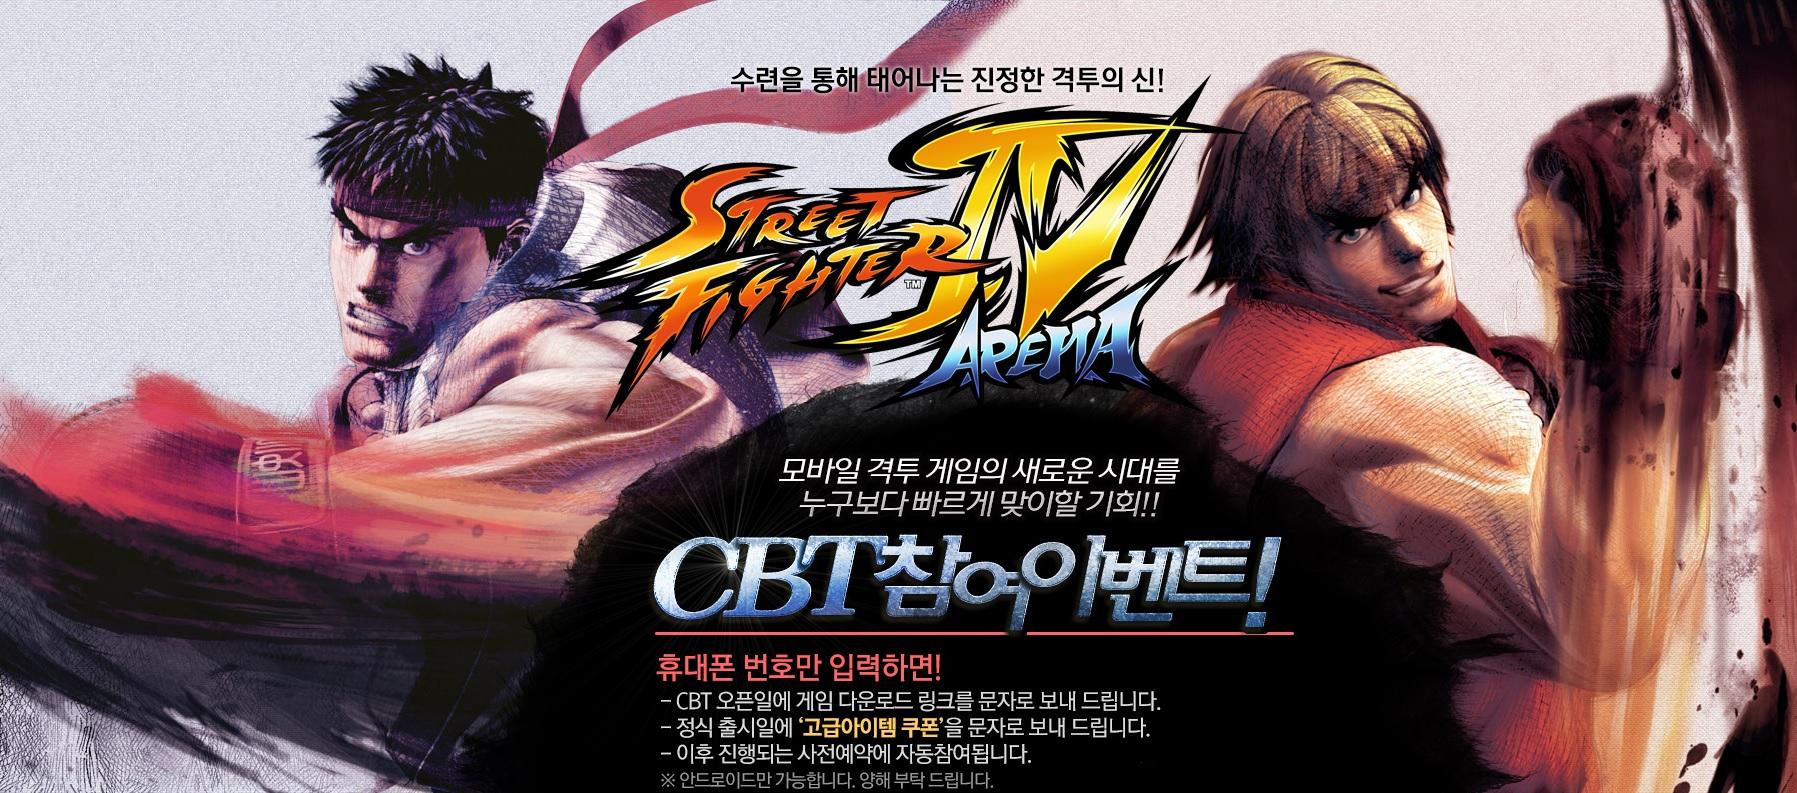 Capcom and Nexon are beta testing Street Fighter IV Arena for mobile in Korea